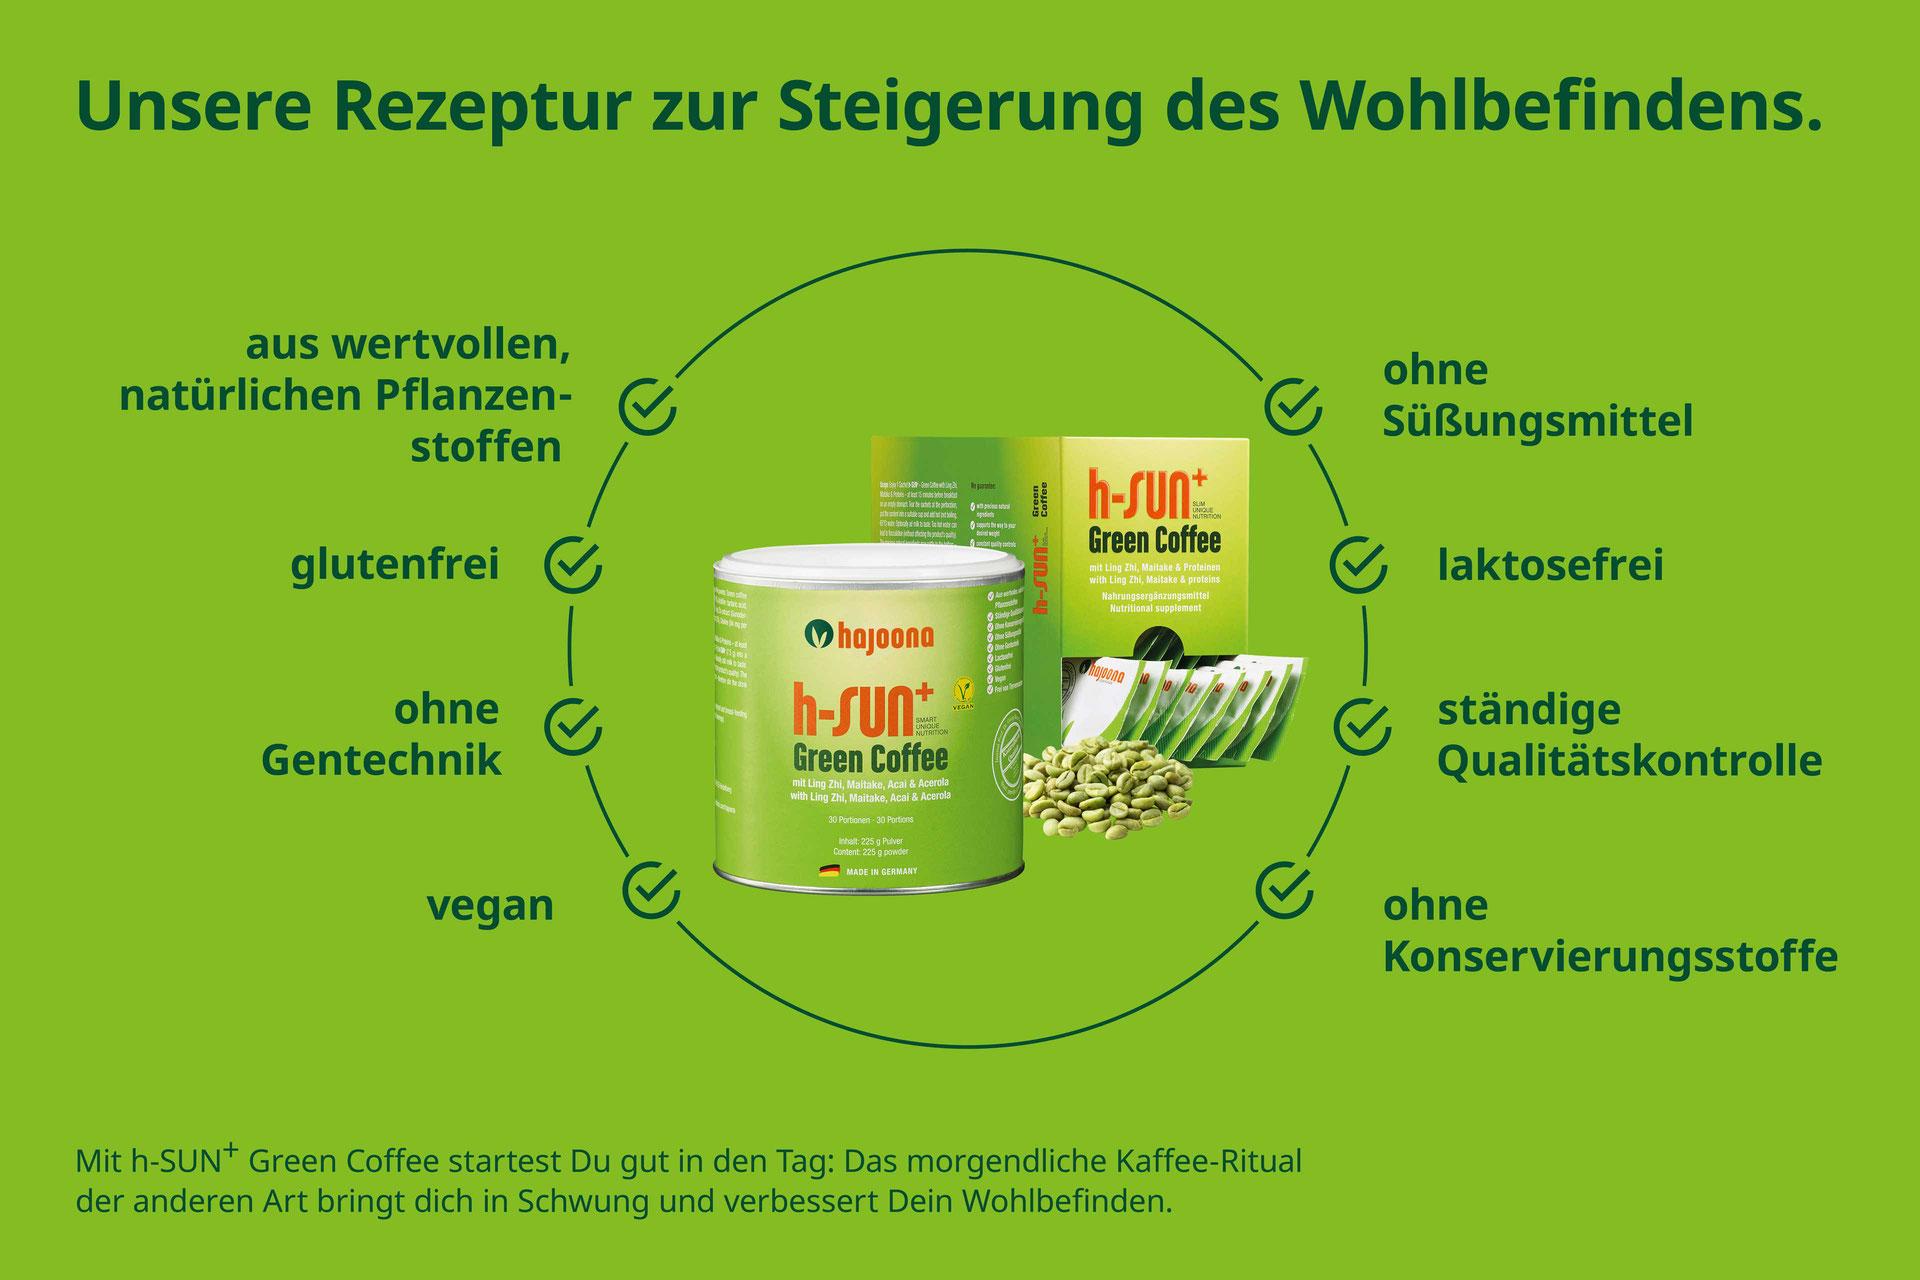 Grüne Kaffeebohnen zum Rösten Bewertungen